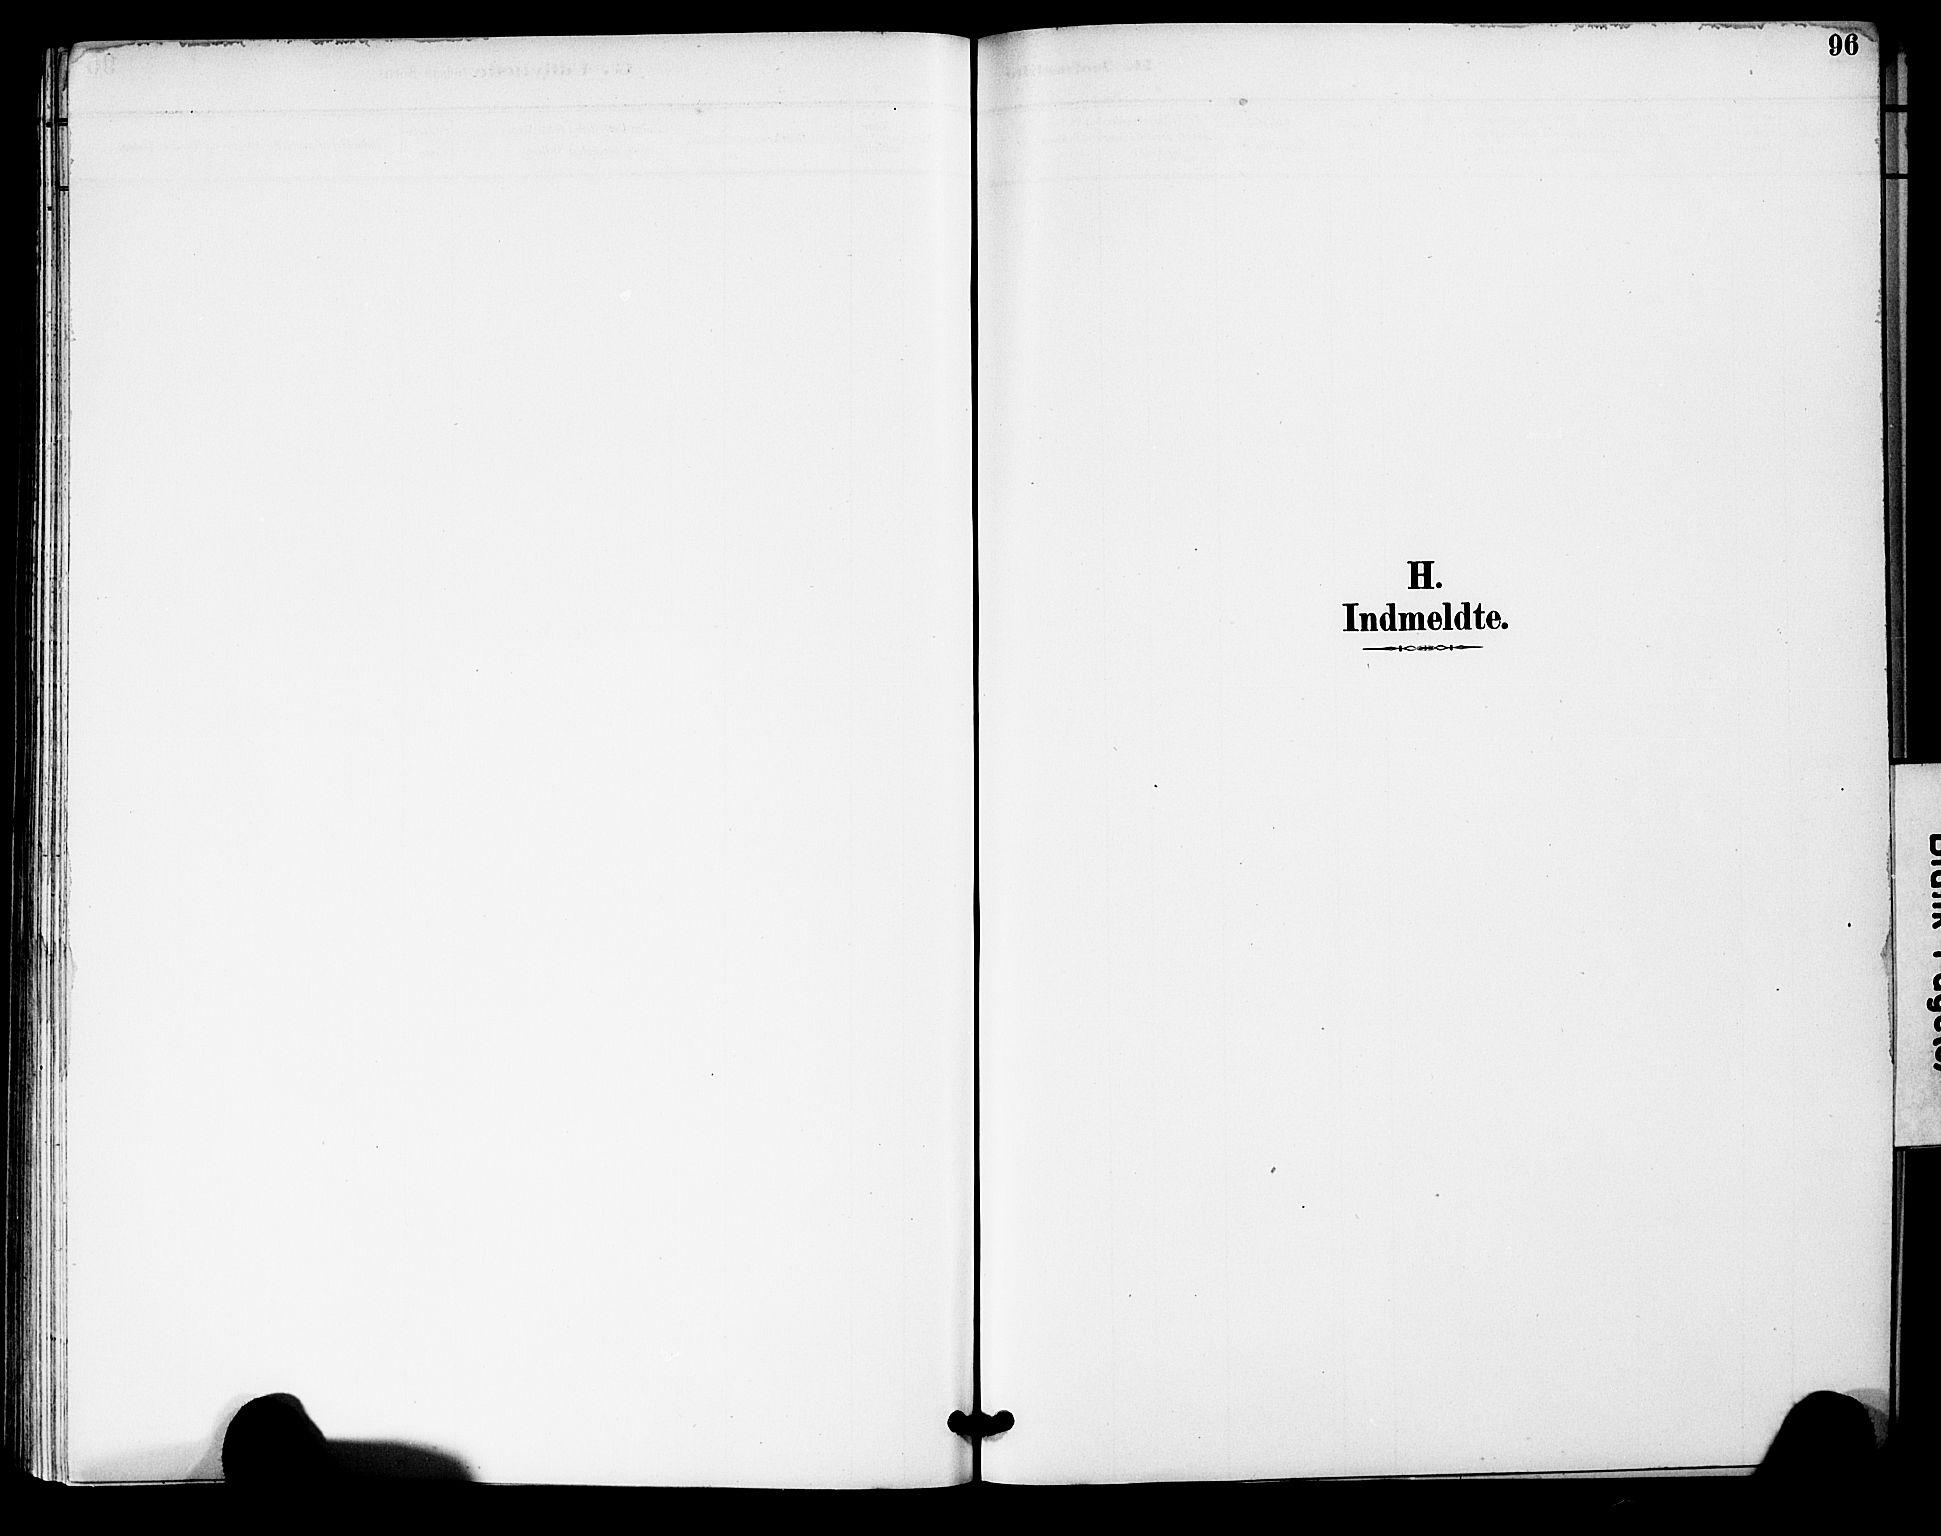 SAK, Bygland sokneprestkontor, F/Fa/Fac/L0001: Ministerialbok nr. A 1, 1885-1909, s. 96